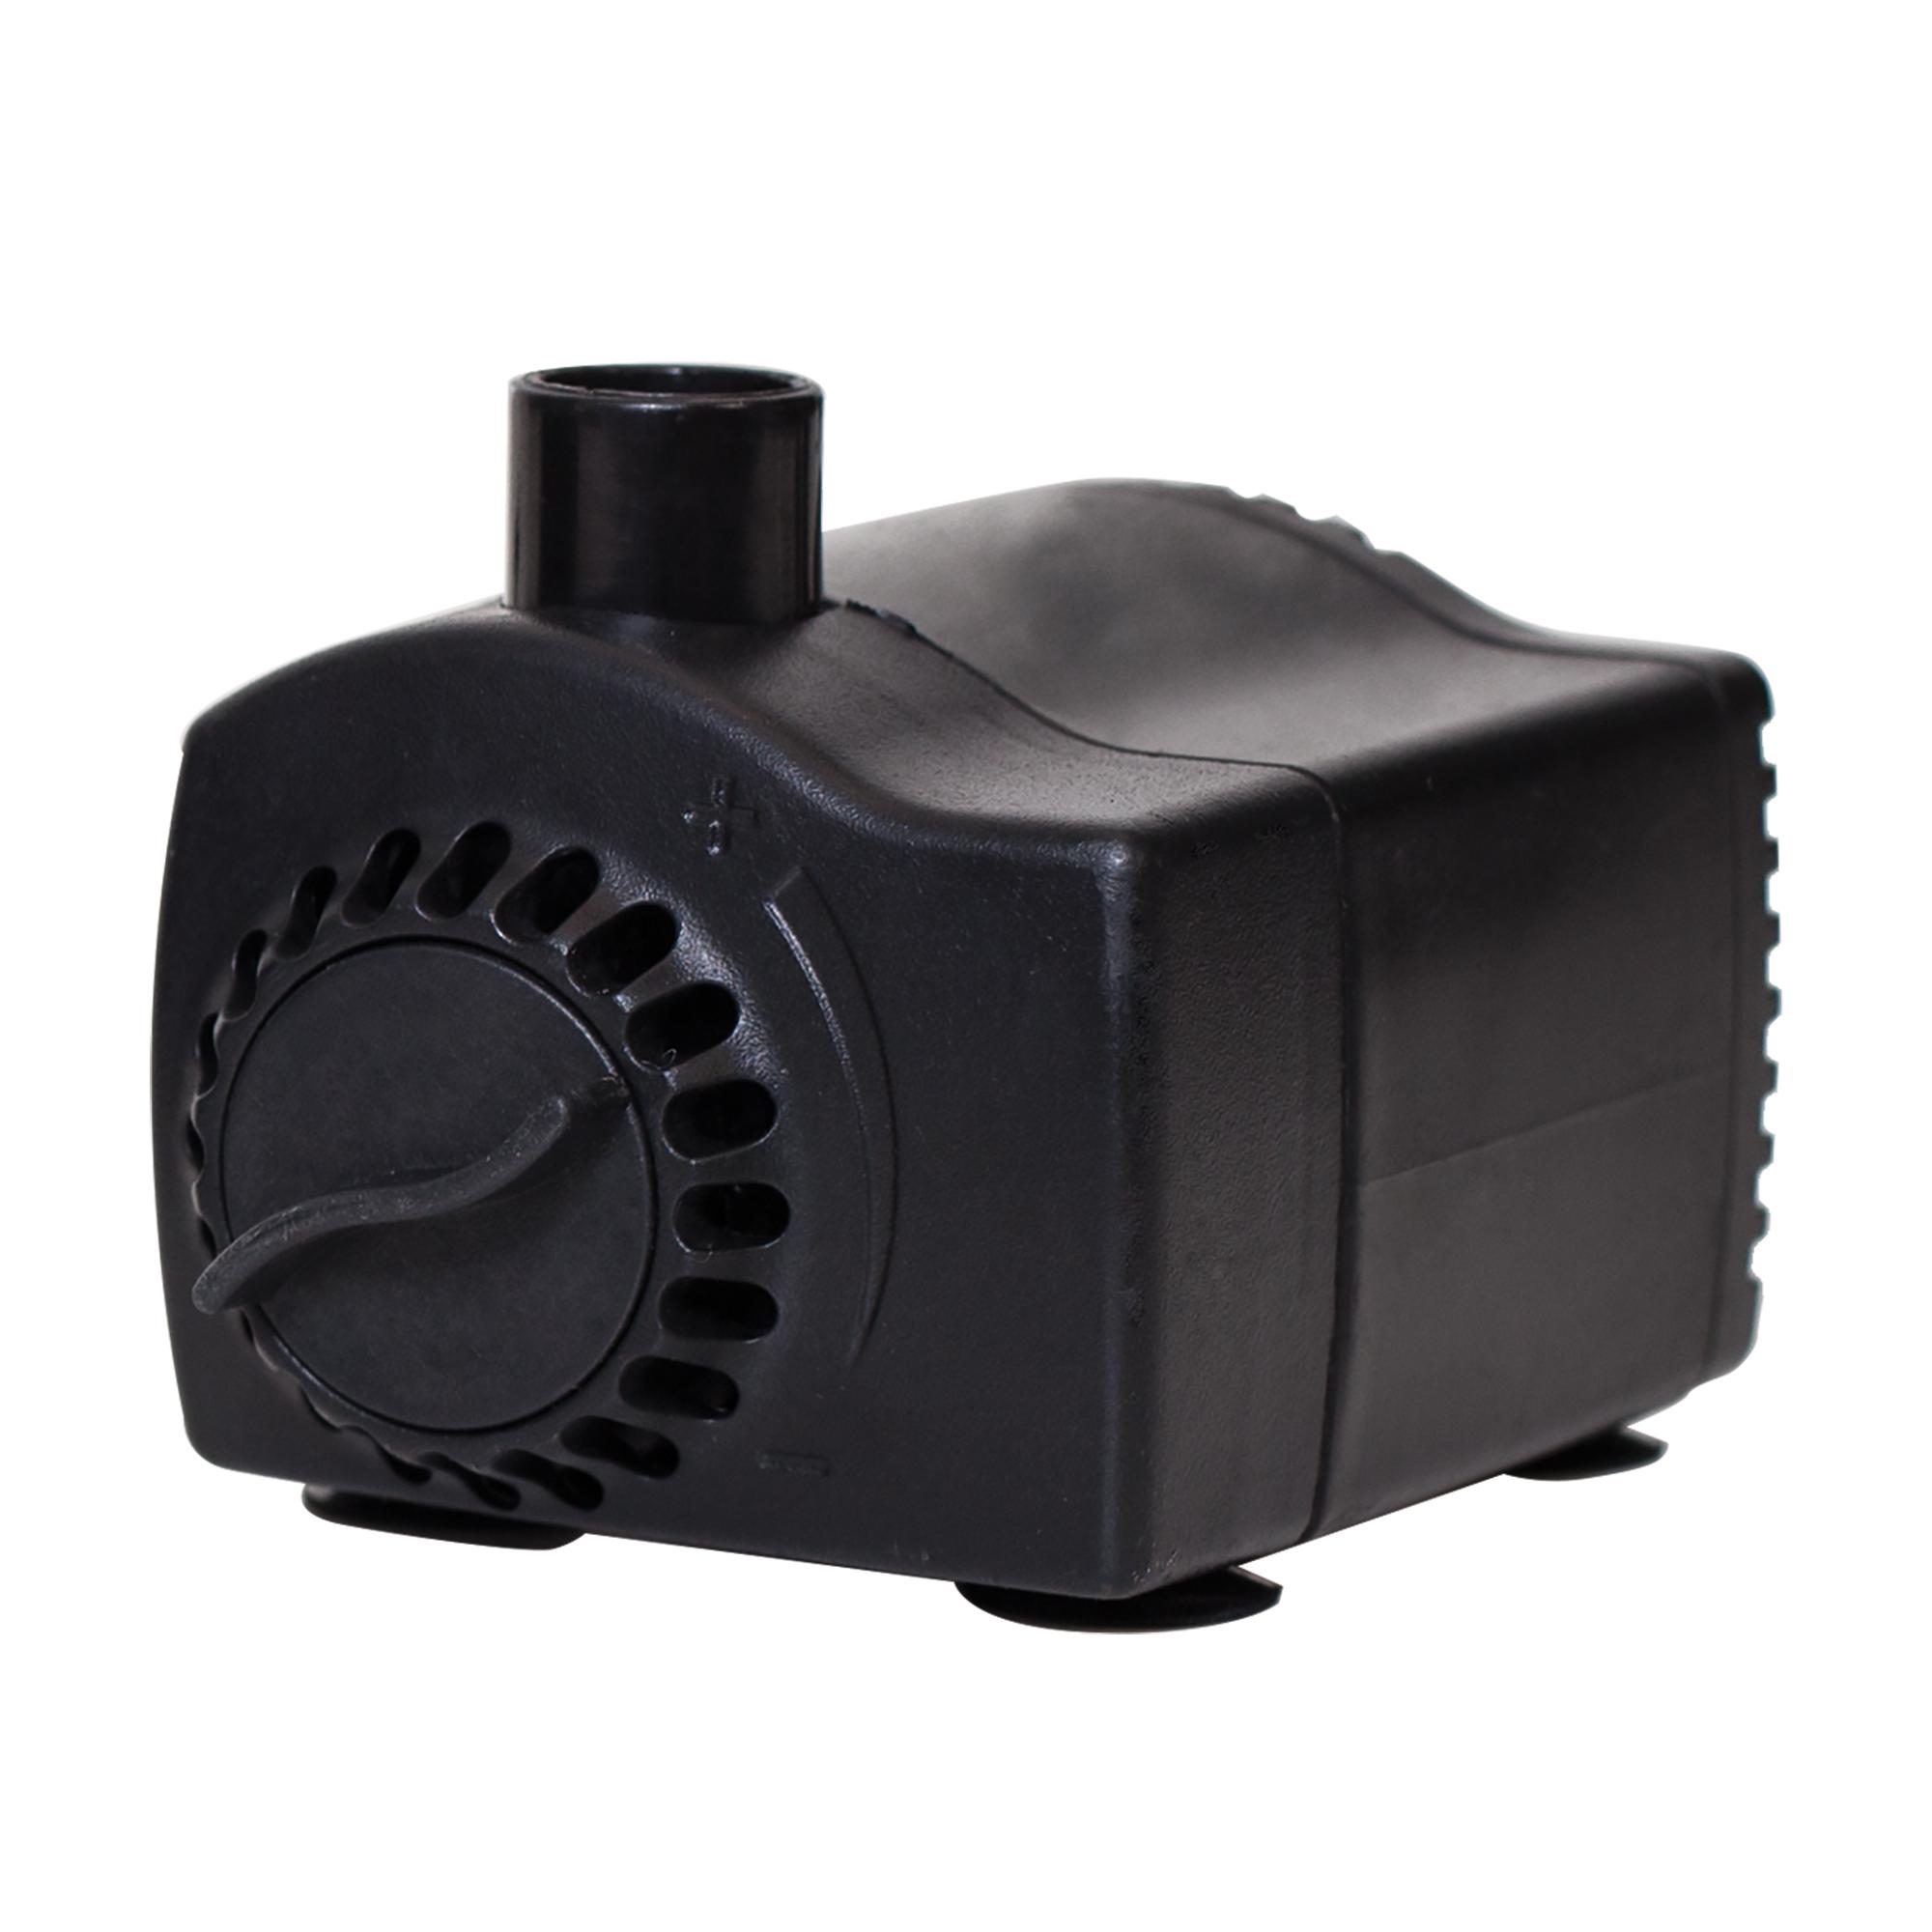 170 GPH Fountain Pump with Auto Shut-Off